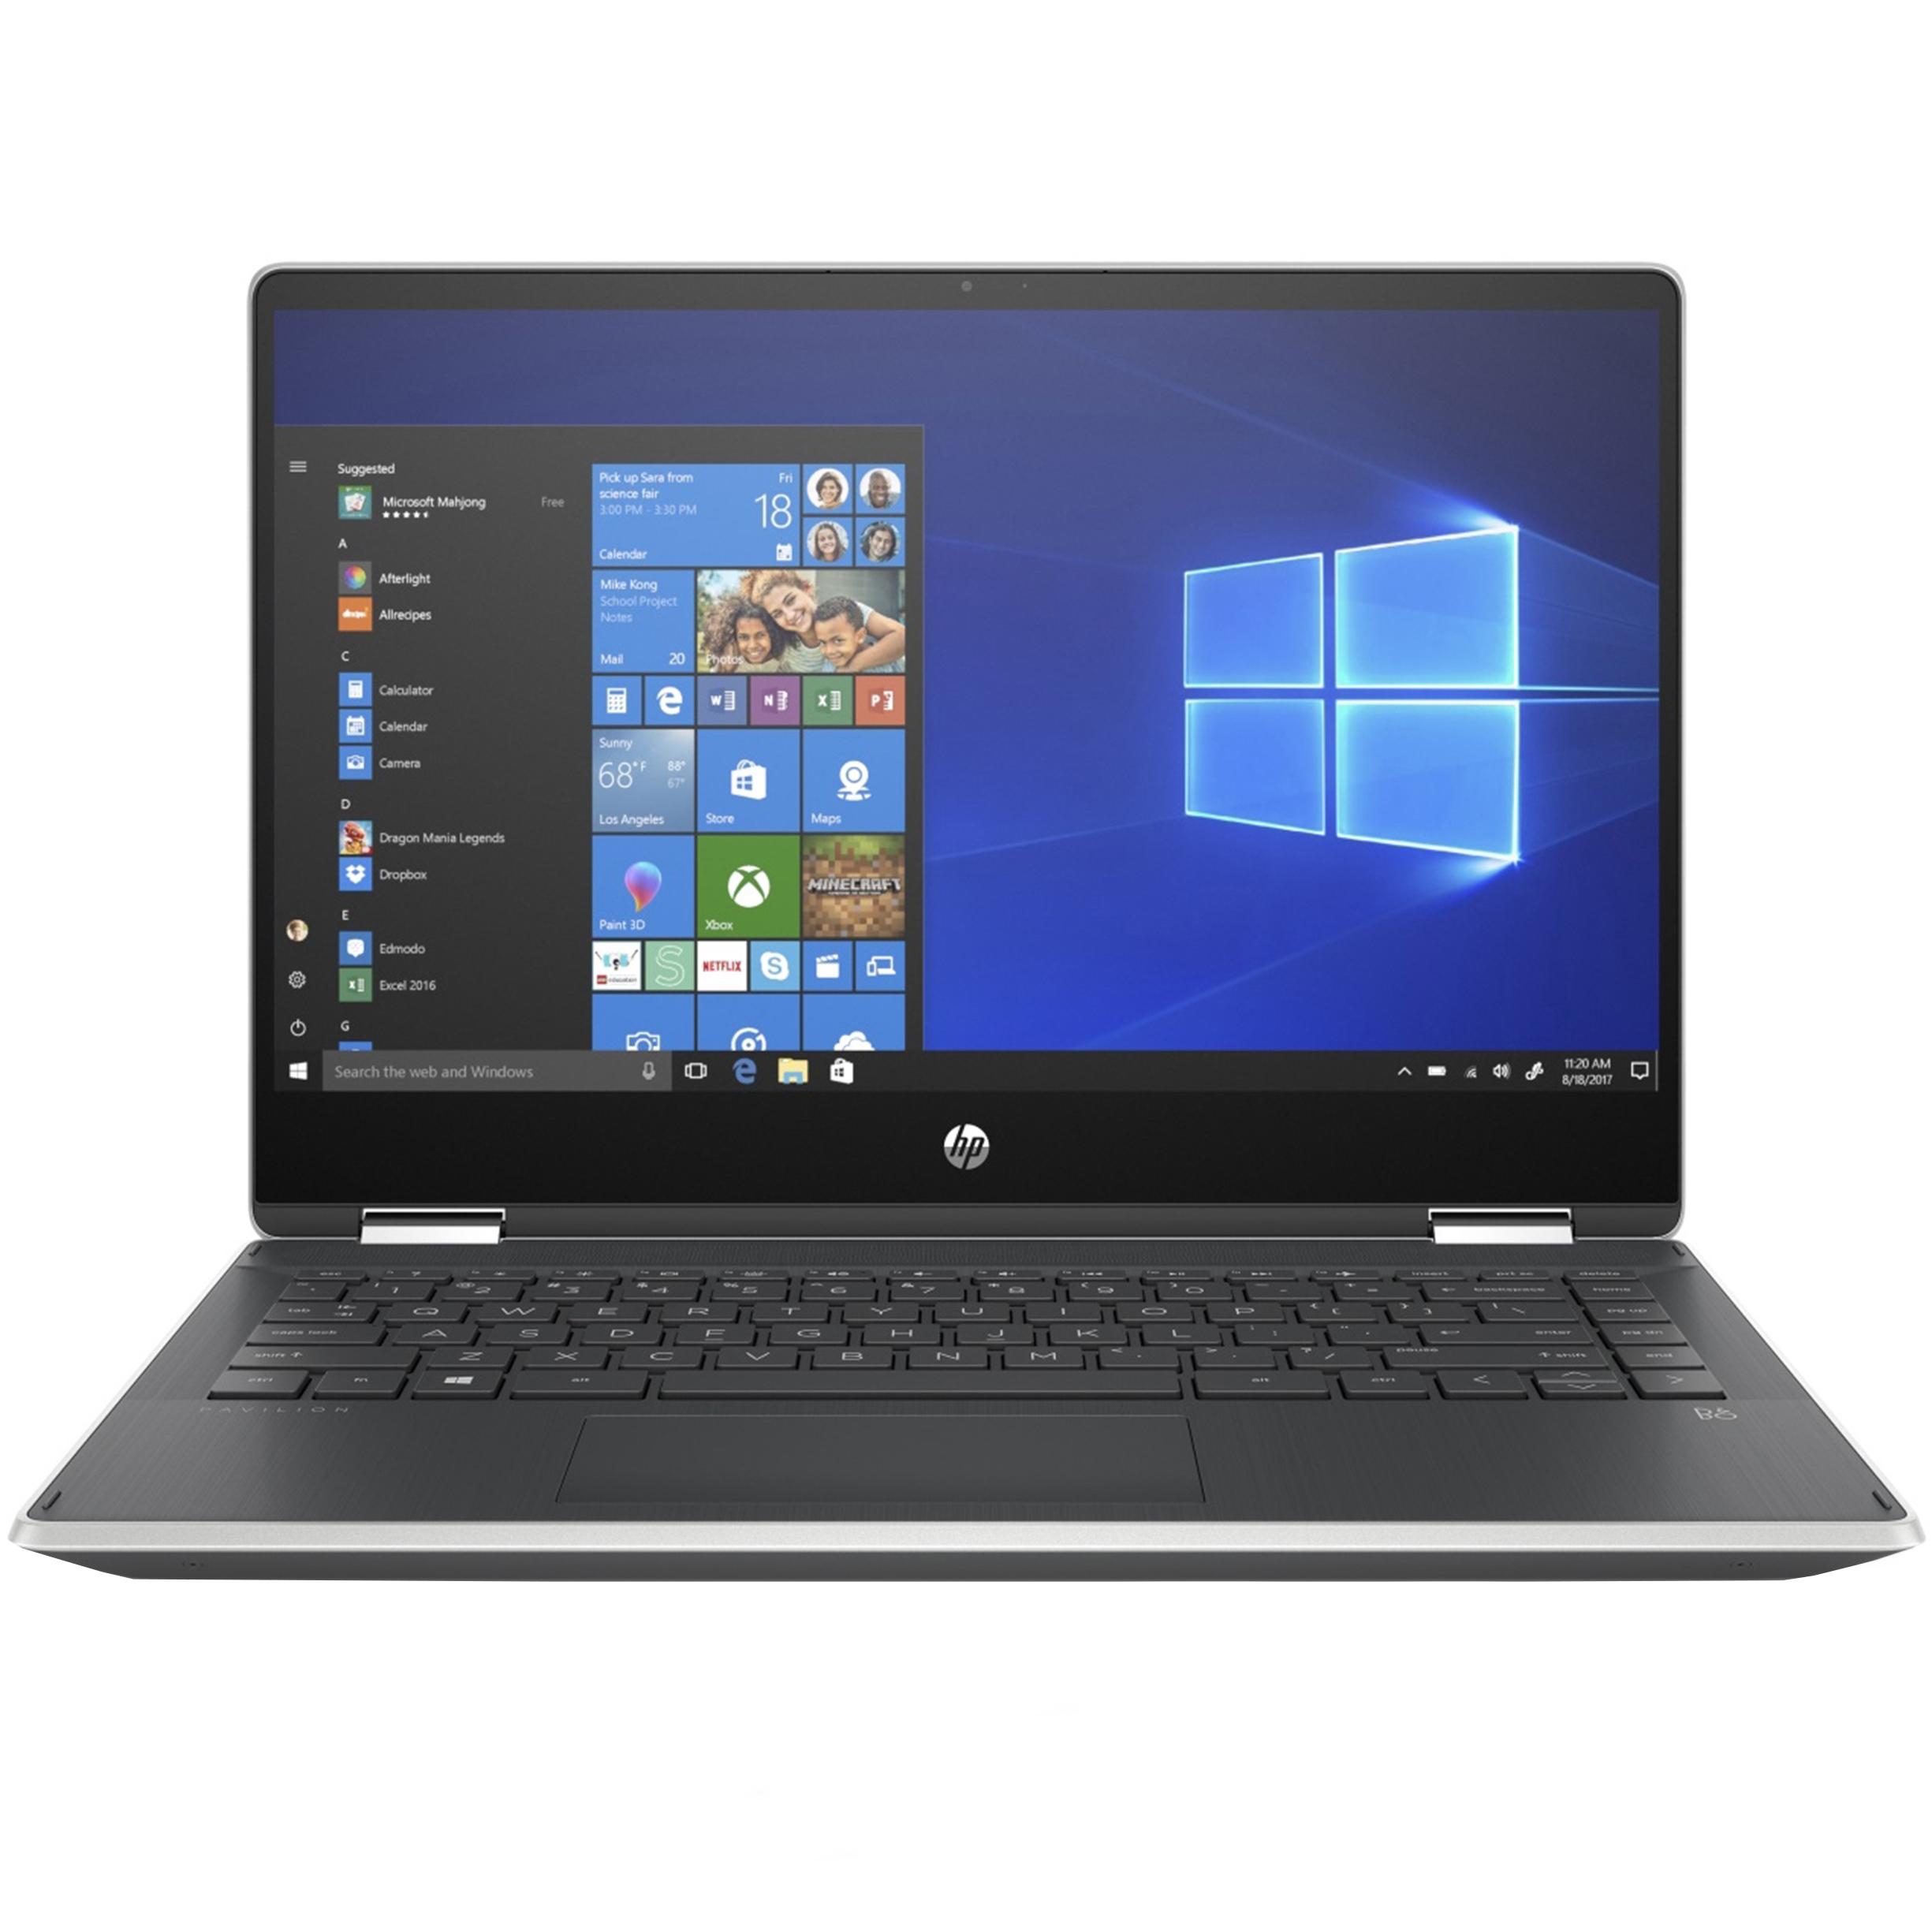 لپ تاپ 14 اینچی اچ پی مدل Pavilion X360 14T-DH000-E